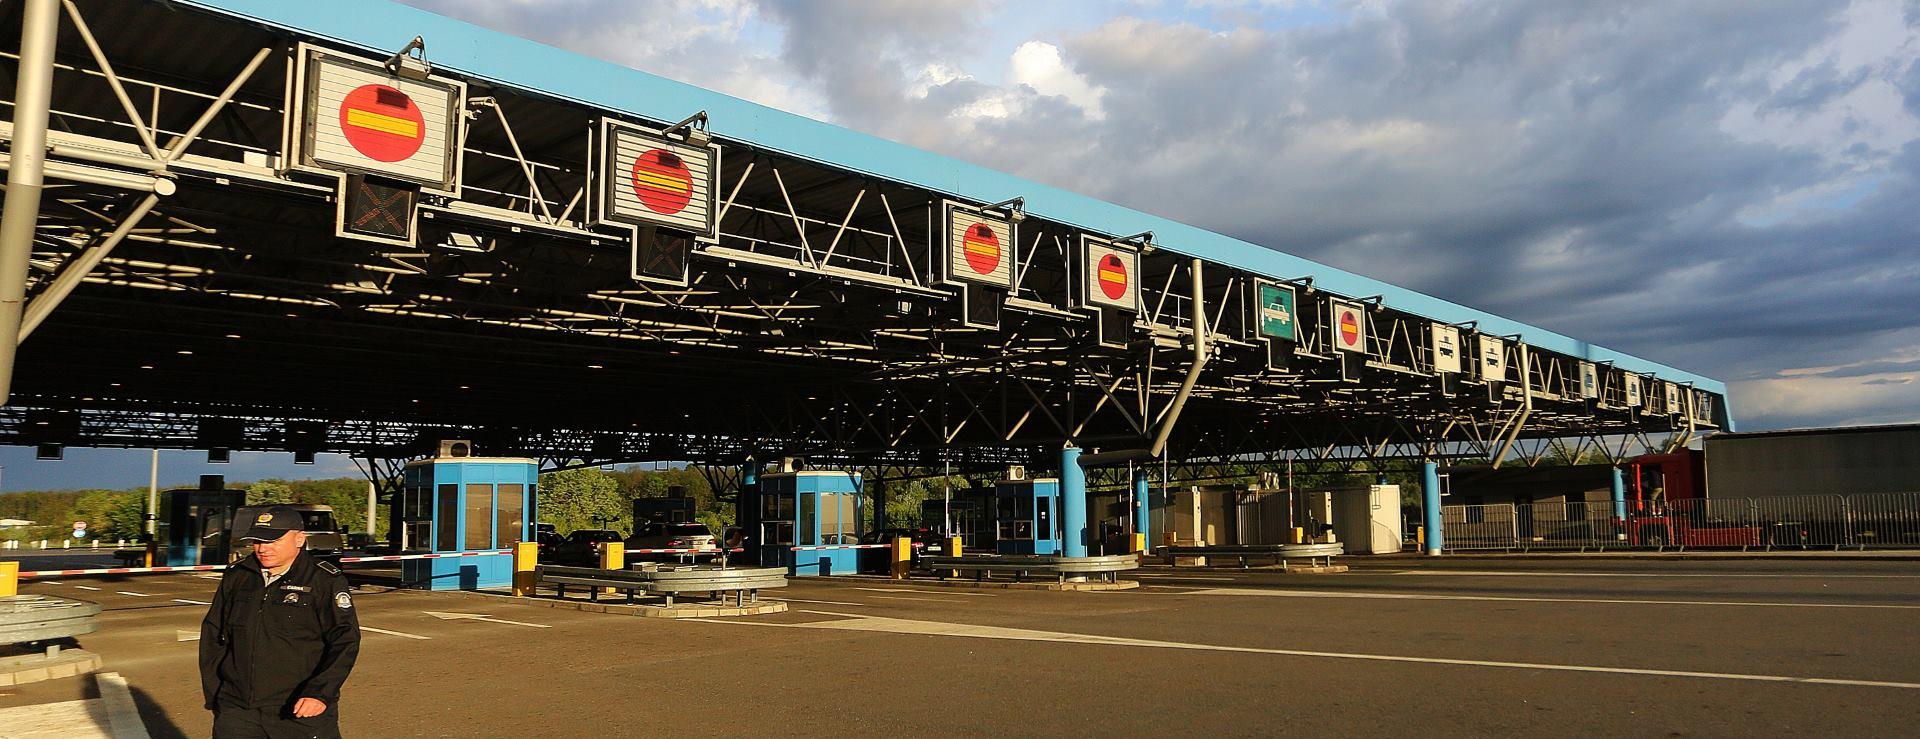 GRANIČNA POLICIJA U okviru Schengen Facility Founda nabavljeno 80 novih vozila